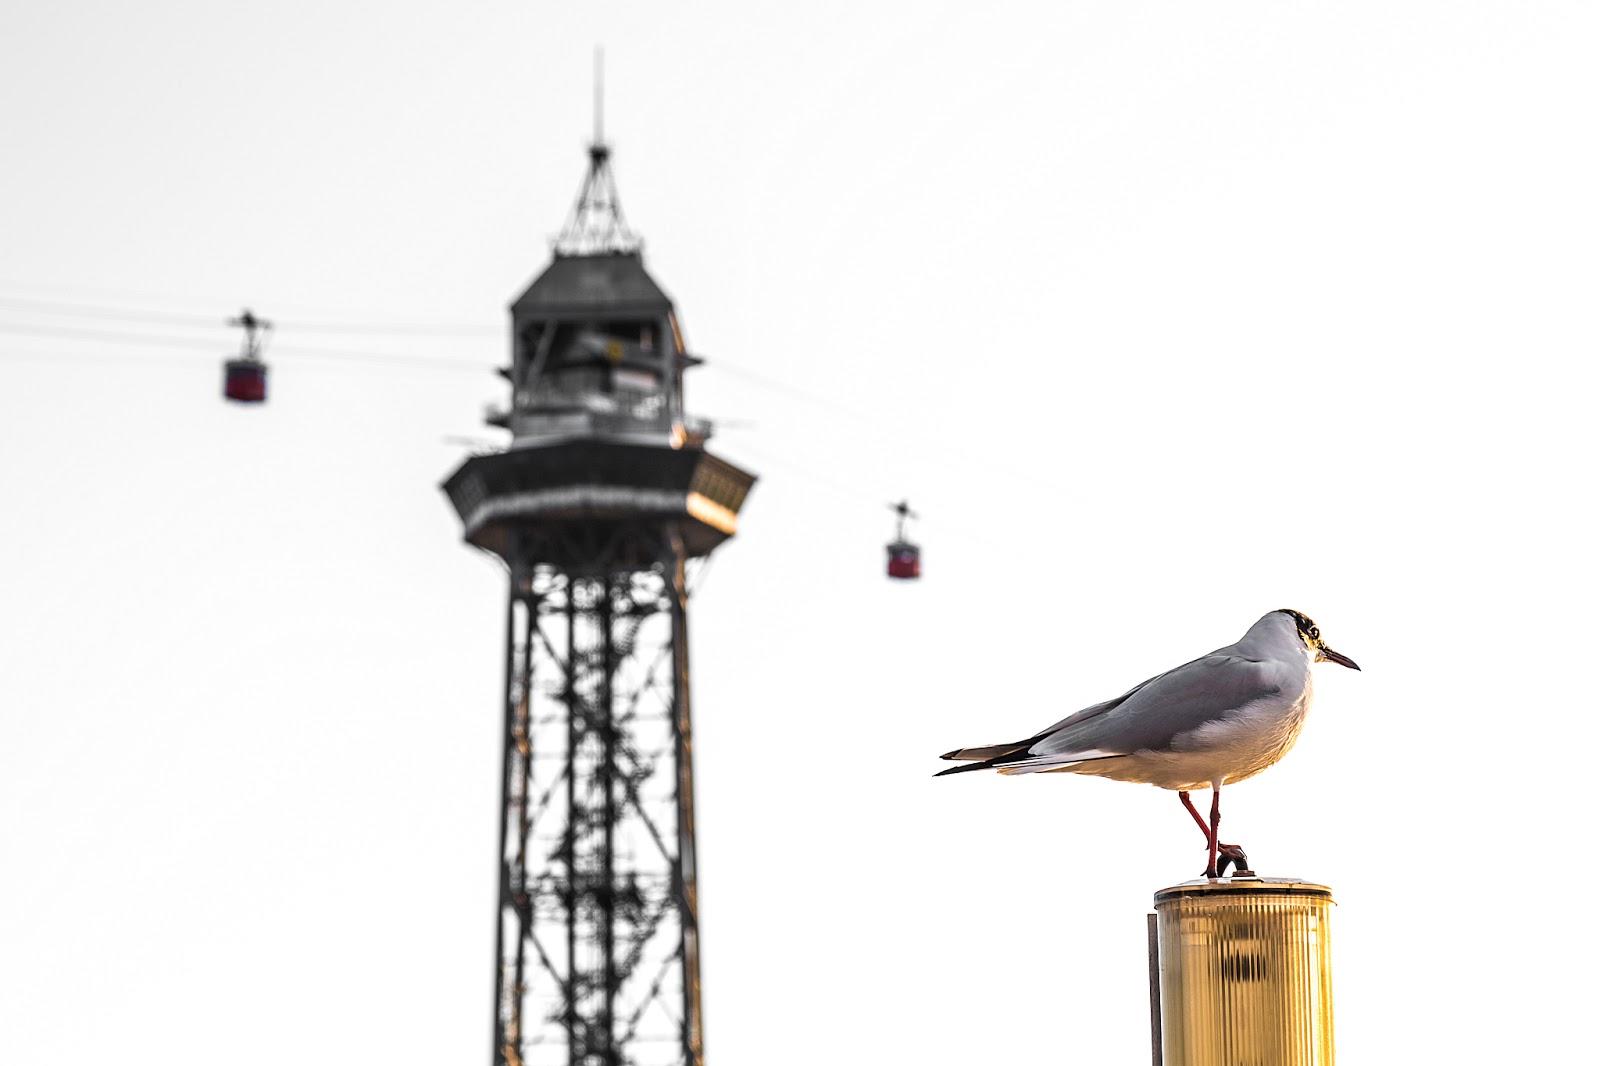 Sobre jaulas y pájaros :: Canon EOS 5D MkIII | ISO100 | Canon 24-105@105mm | f/9.0 | 1/125s